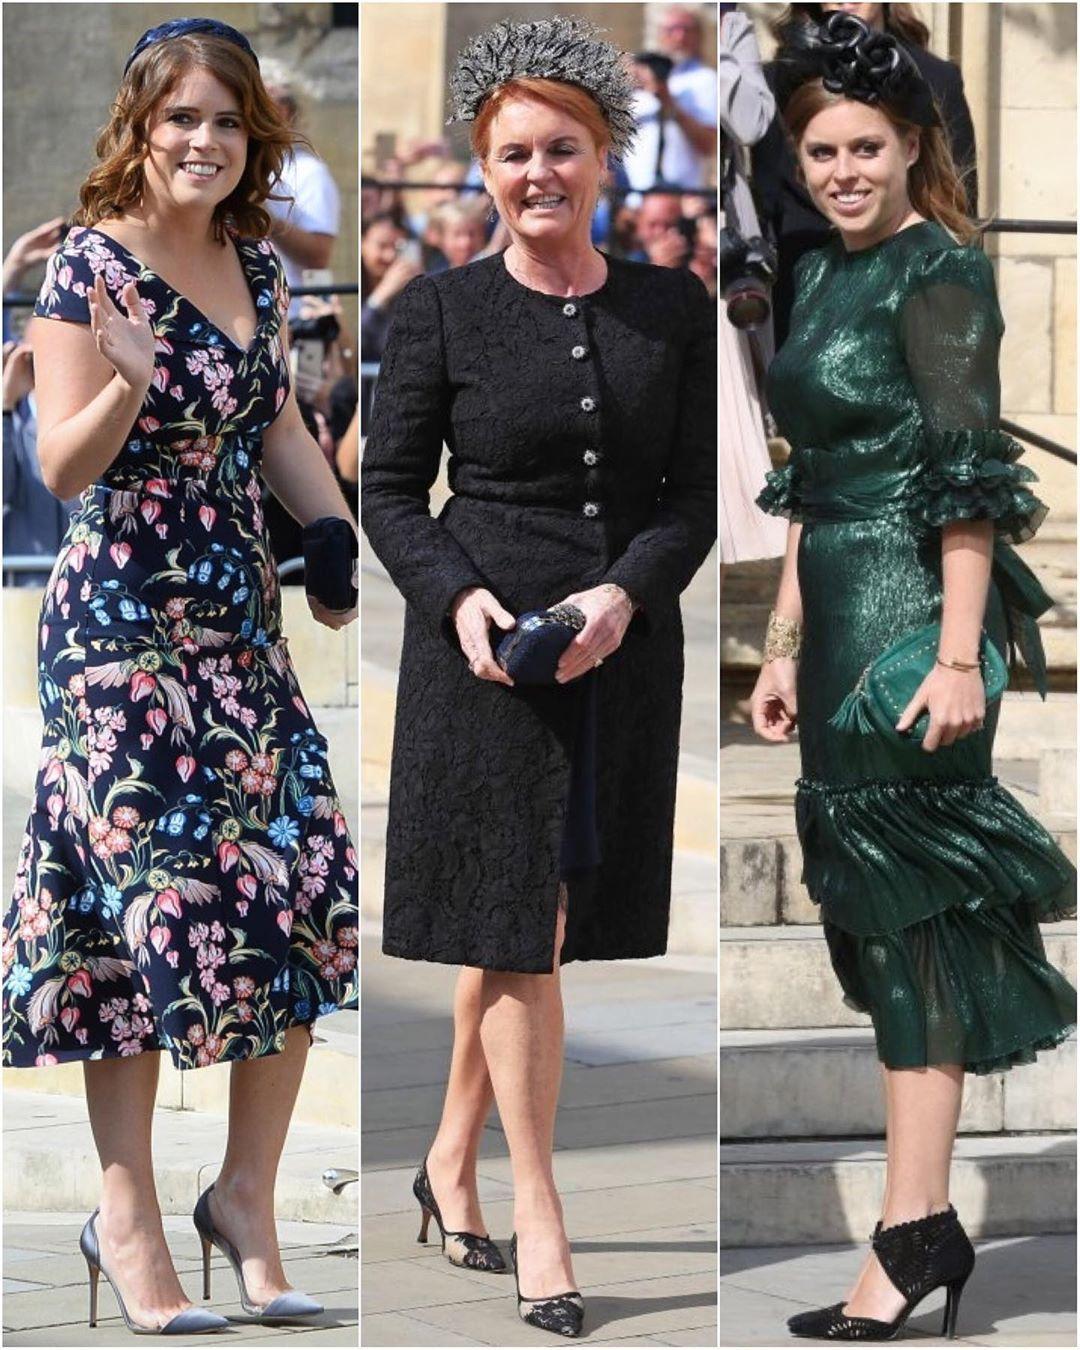 New Princess Beatrice and Edoardo Mapelli Mozzi, Princess